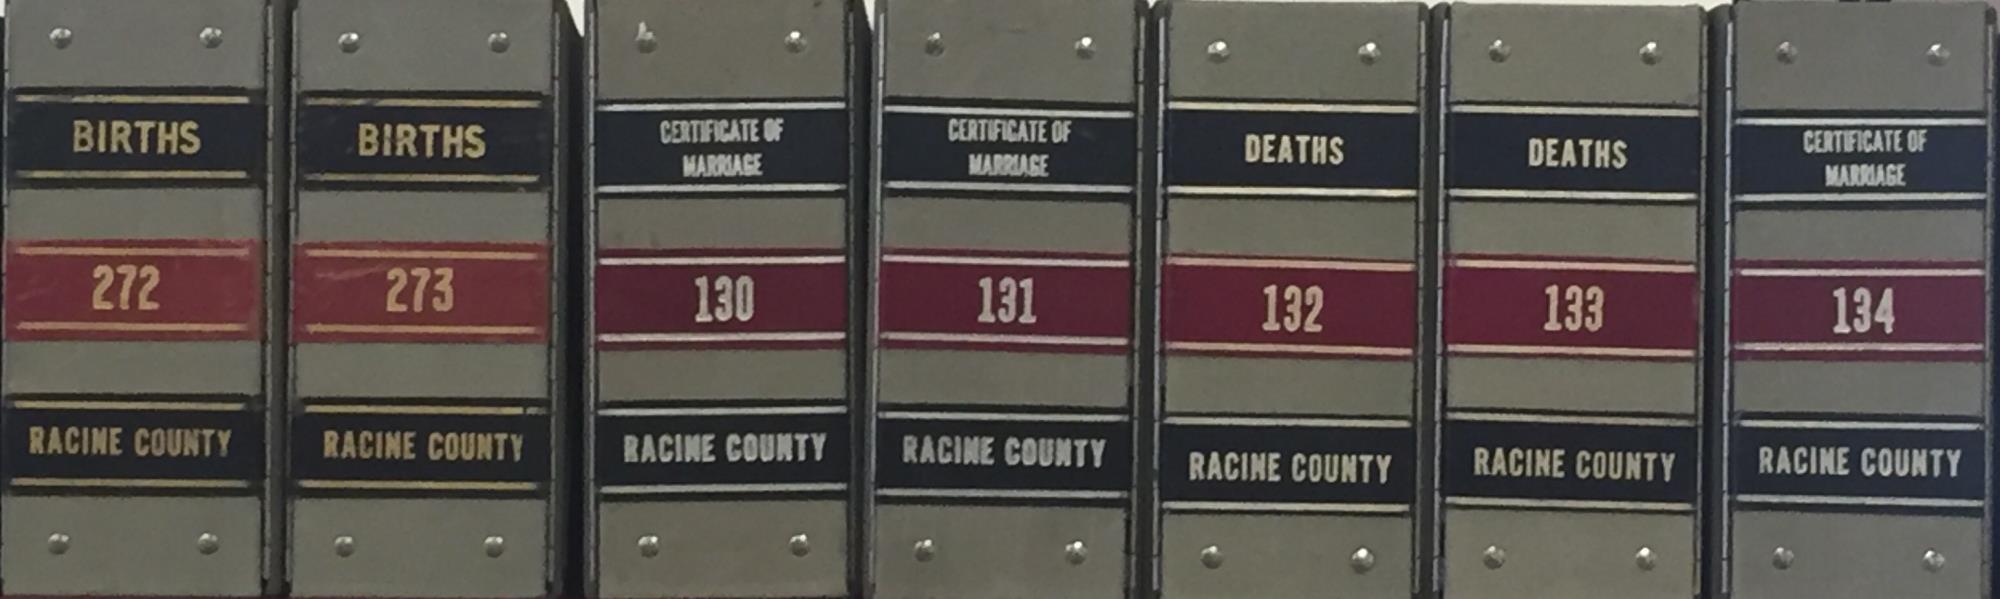 Birth/Marriage/Death/Divorce Certificates | Racine County, WI